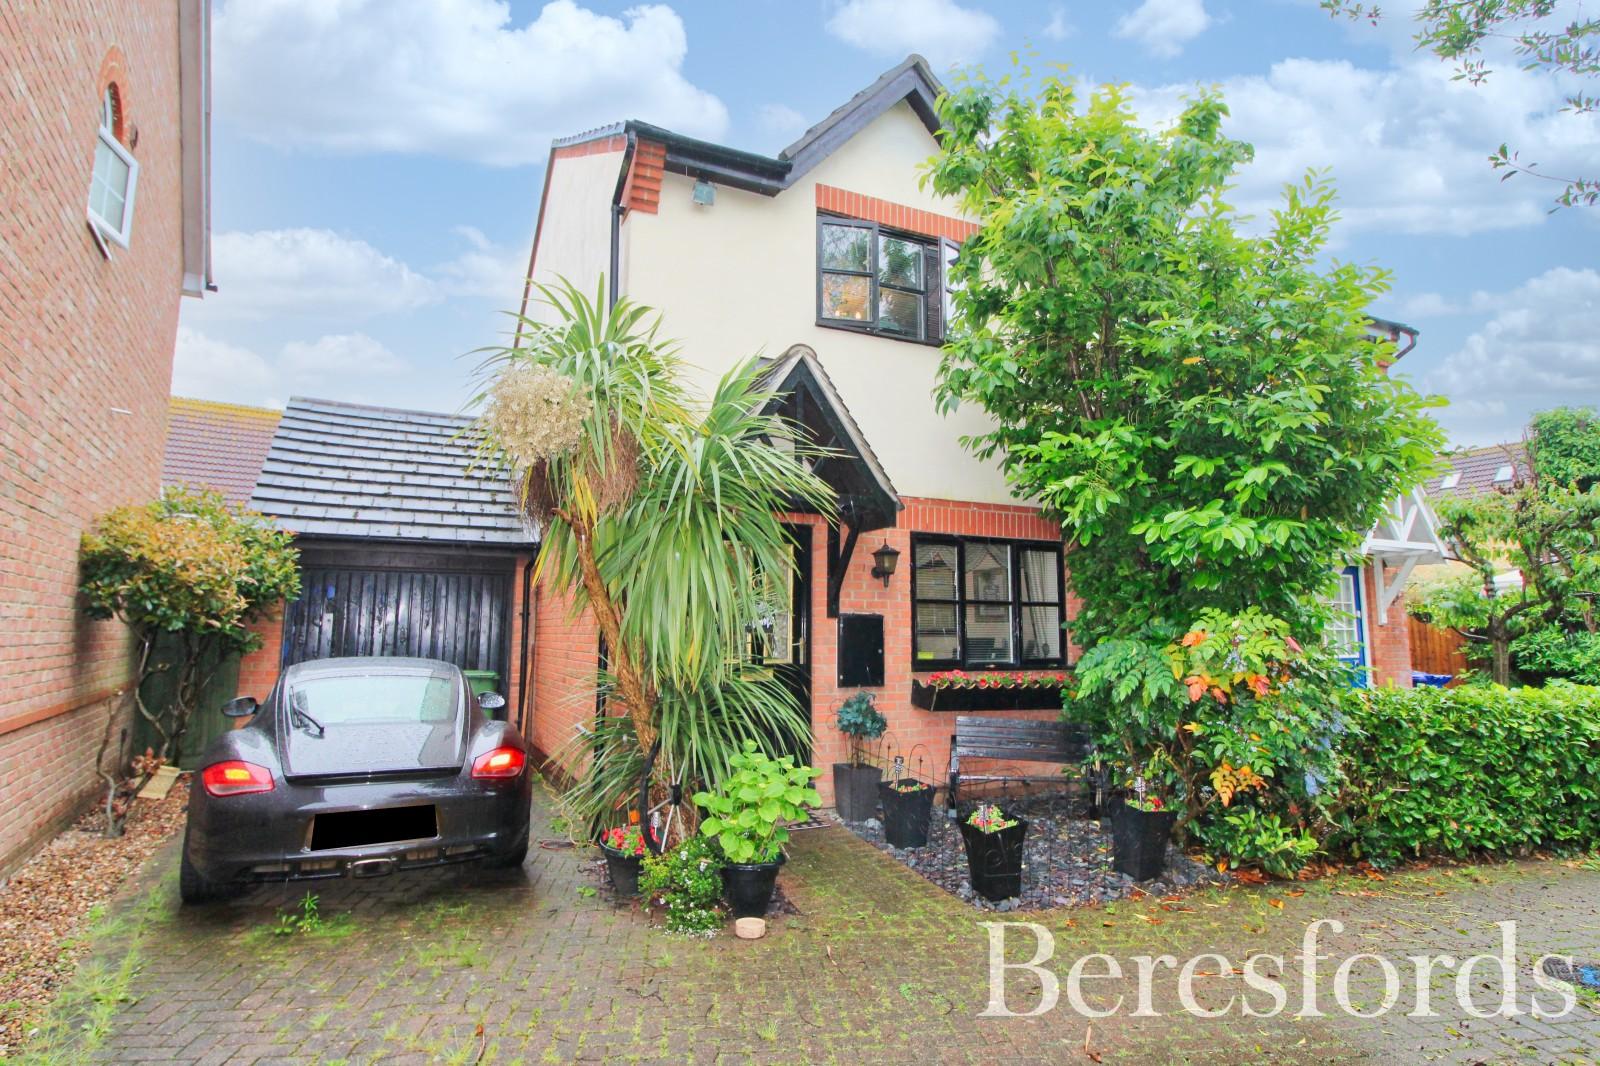 Birch Crescent, Brandon Groves, South Ockendon, Essex, RM15